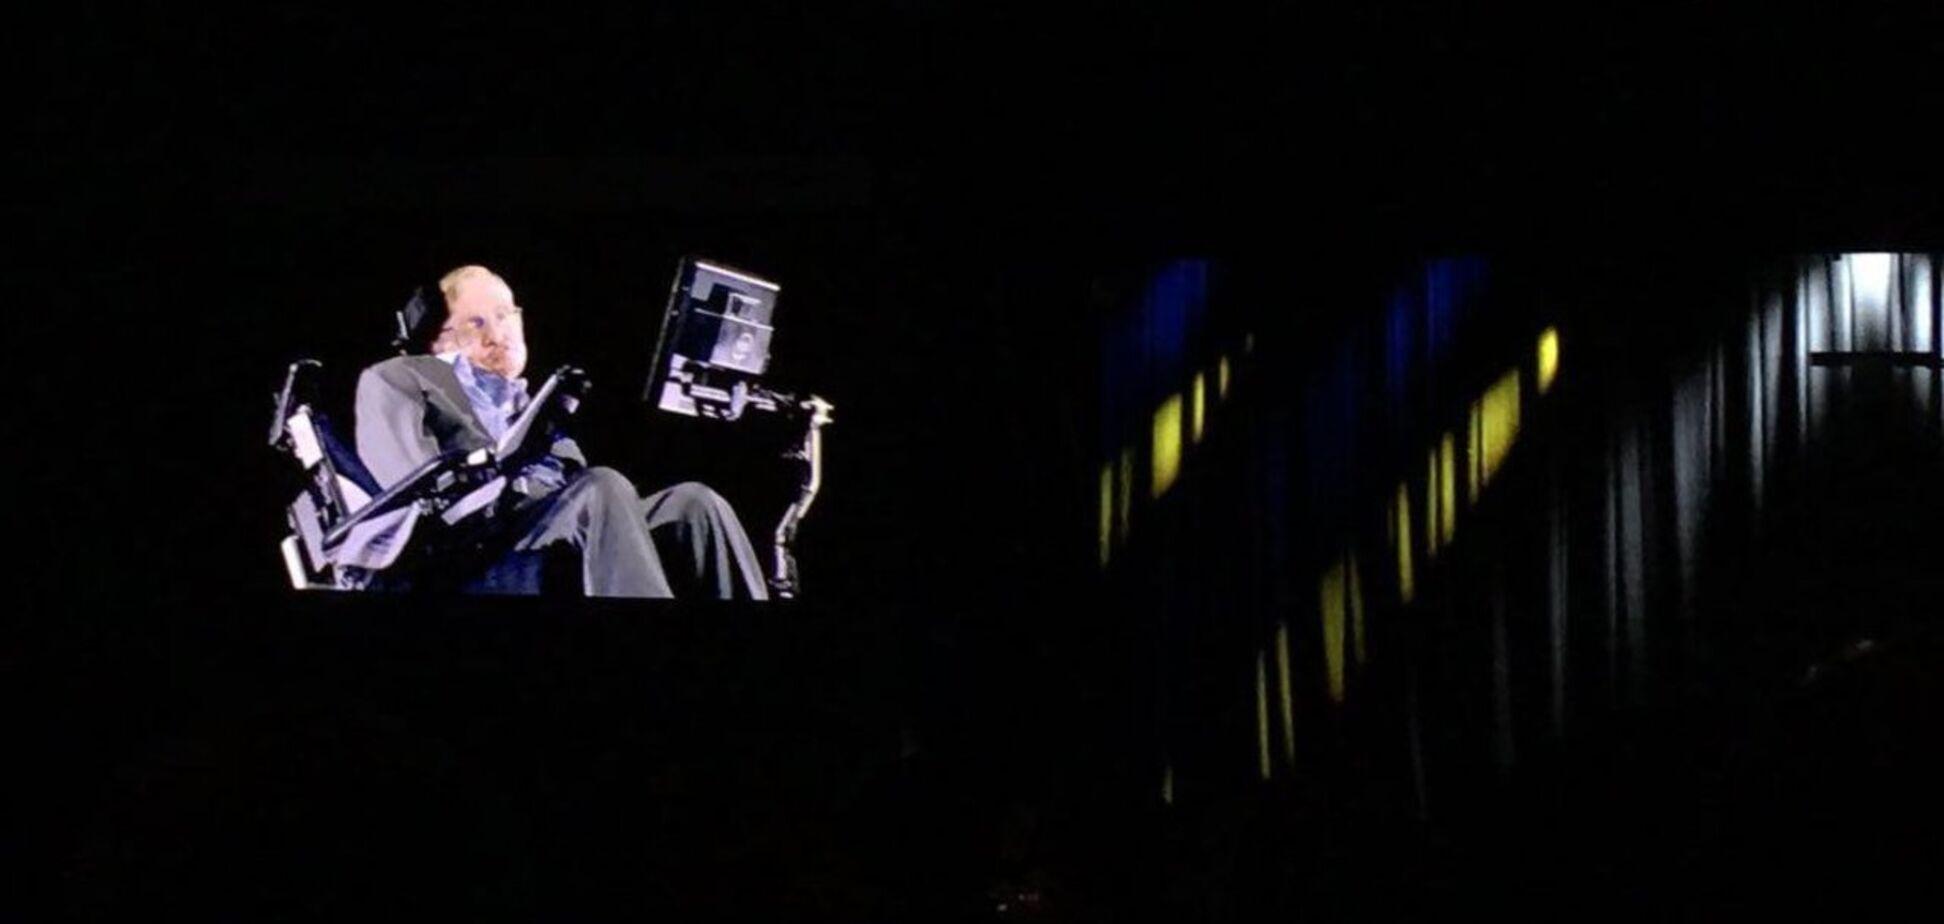 Голограмма Стивена Хокинга в Киеве